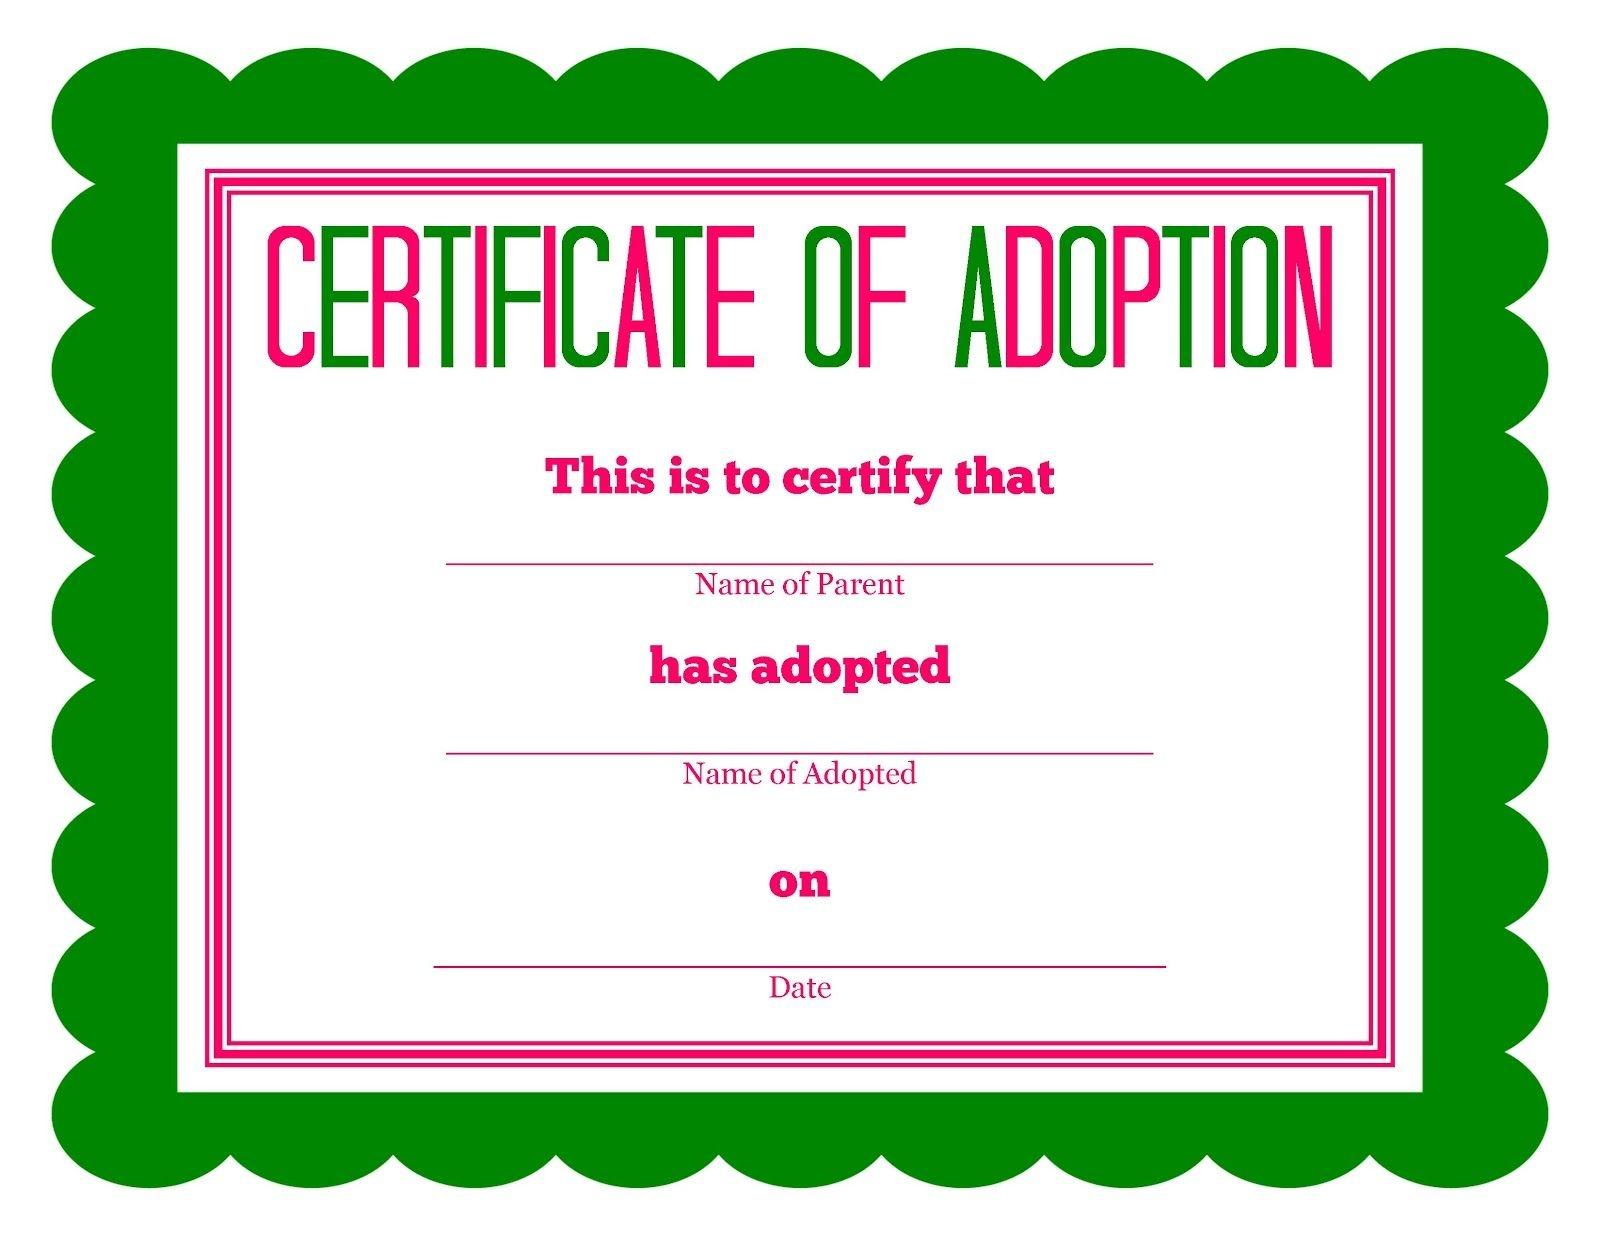 Free Printable Stuffed Animal Adoption Certificate | Free Printables - Free Printable Stuffed Animal Adoption Certificate